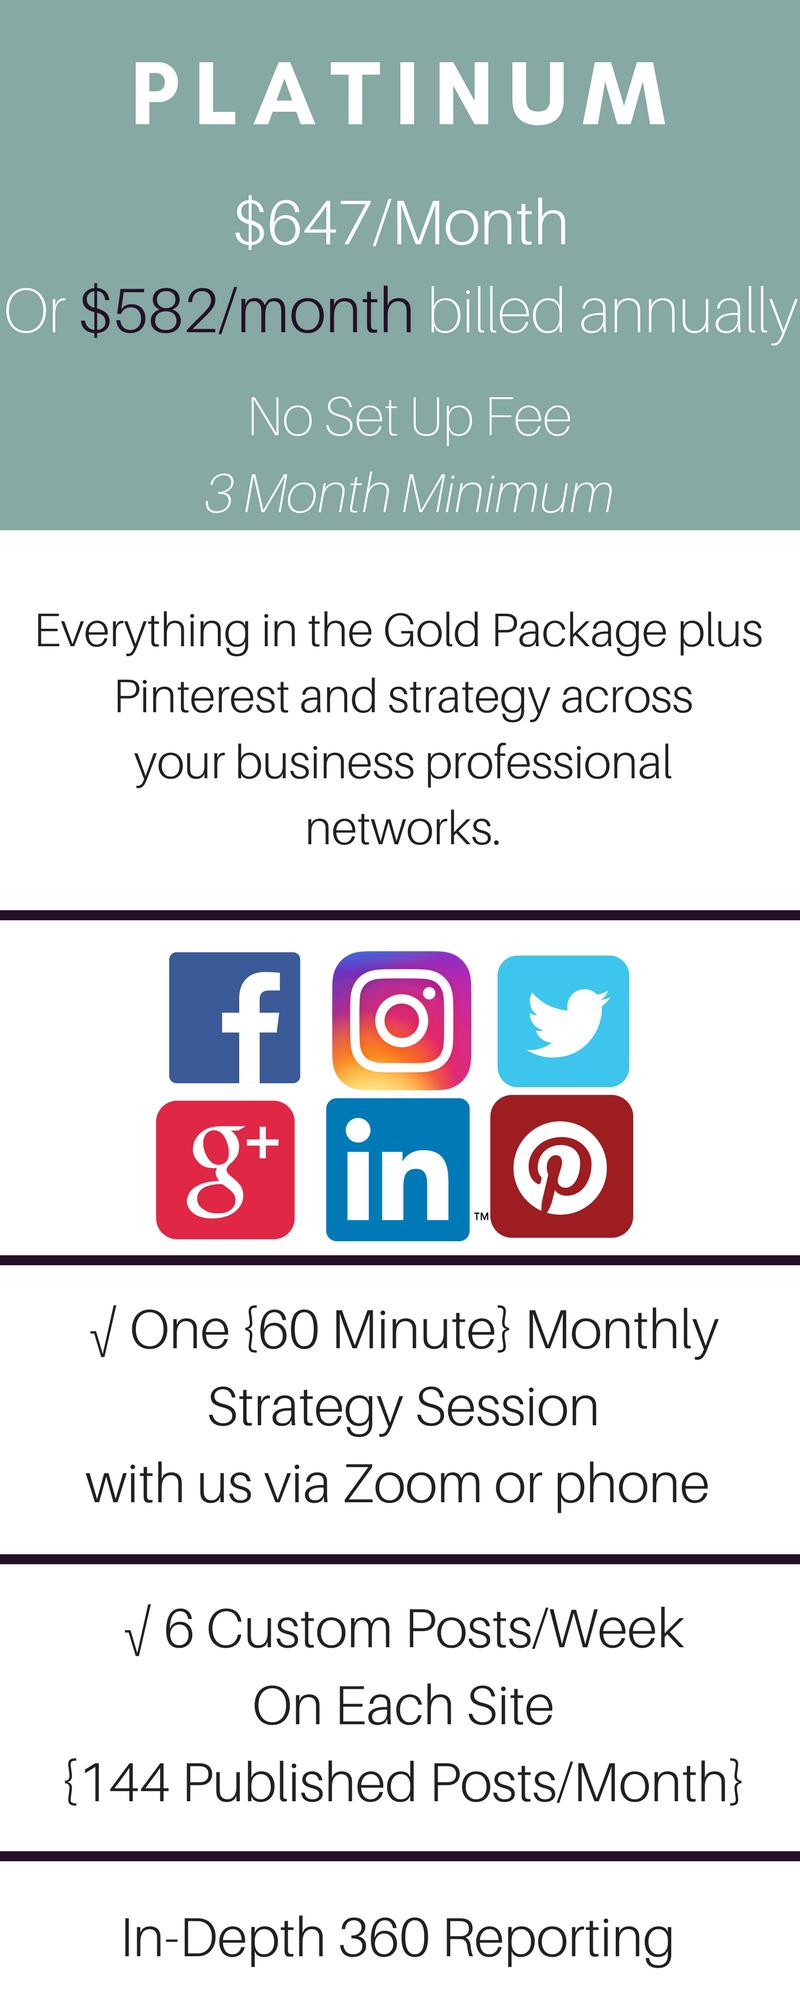 platinum social media marketing package - perfectwavemarketing.com.png